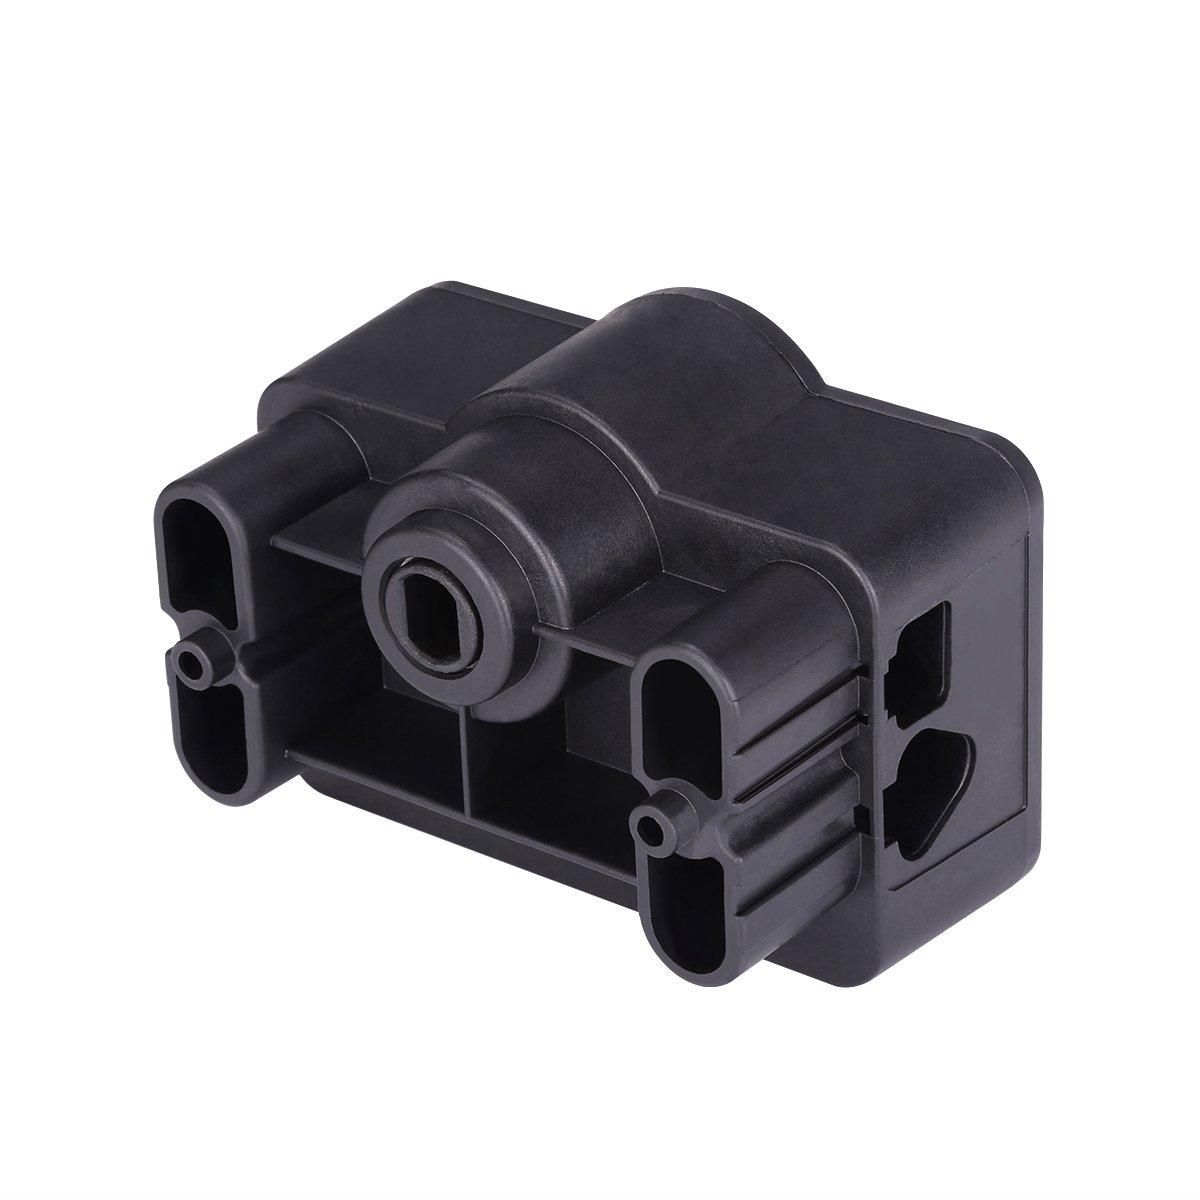 10L0L Club Car MCOR Accelerator Controller Input #103327901, Accelerator for Club Car Precedent Golf Carts (2004-2011) by 10L0L (Image #5)